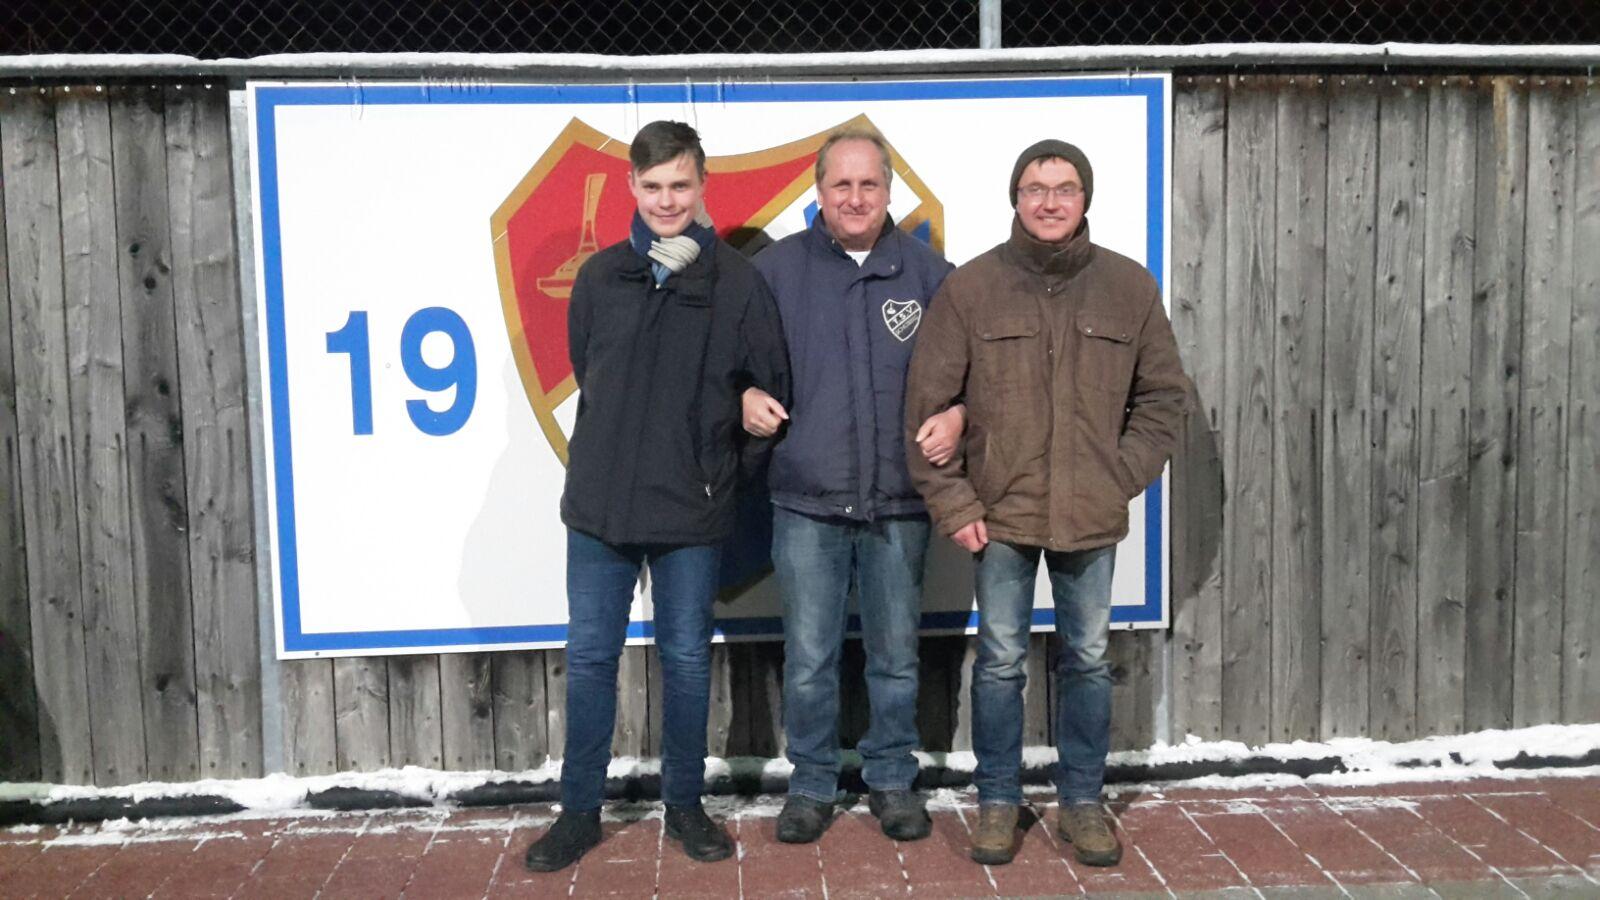 Gewinner der Vereinsmeisterschaft